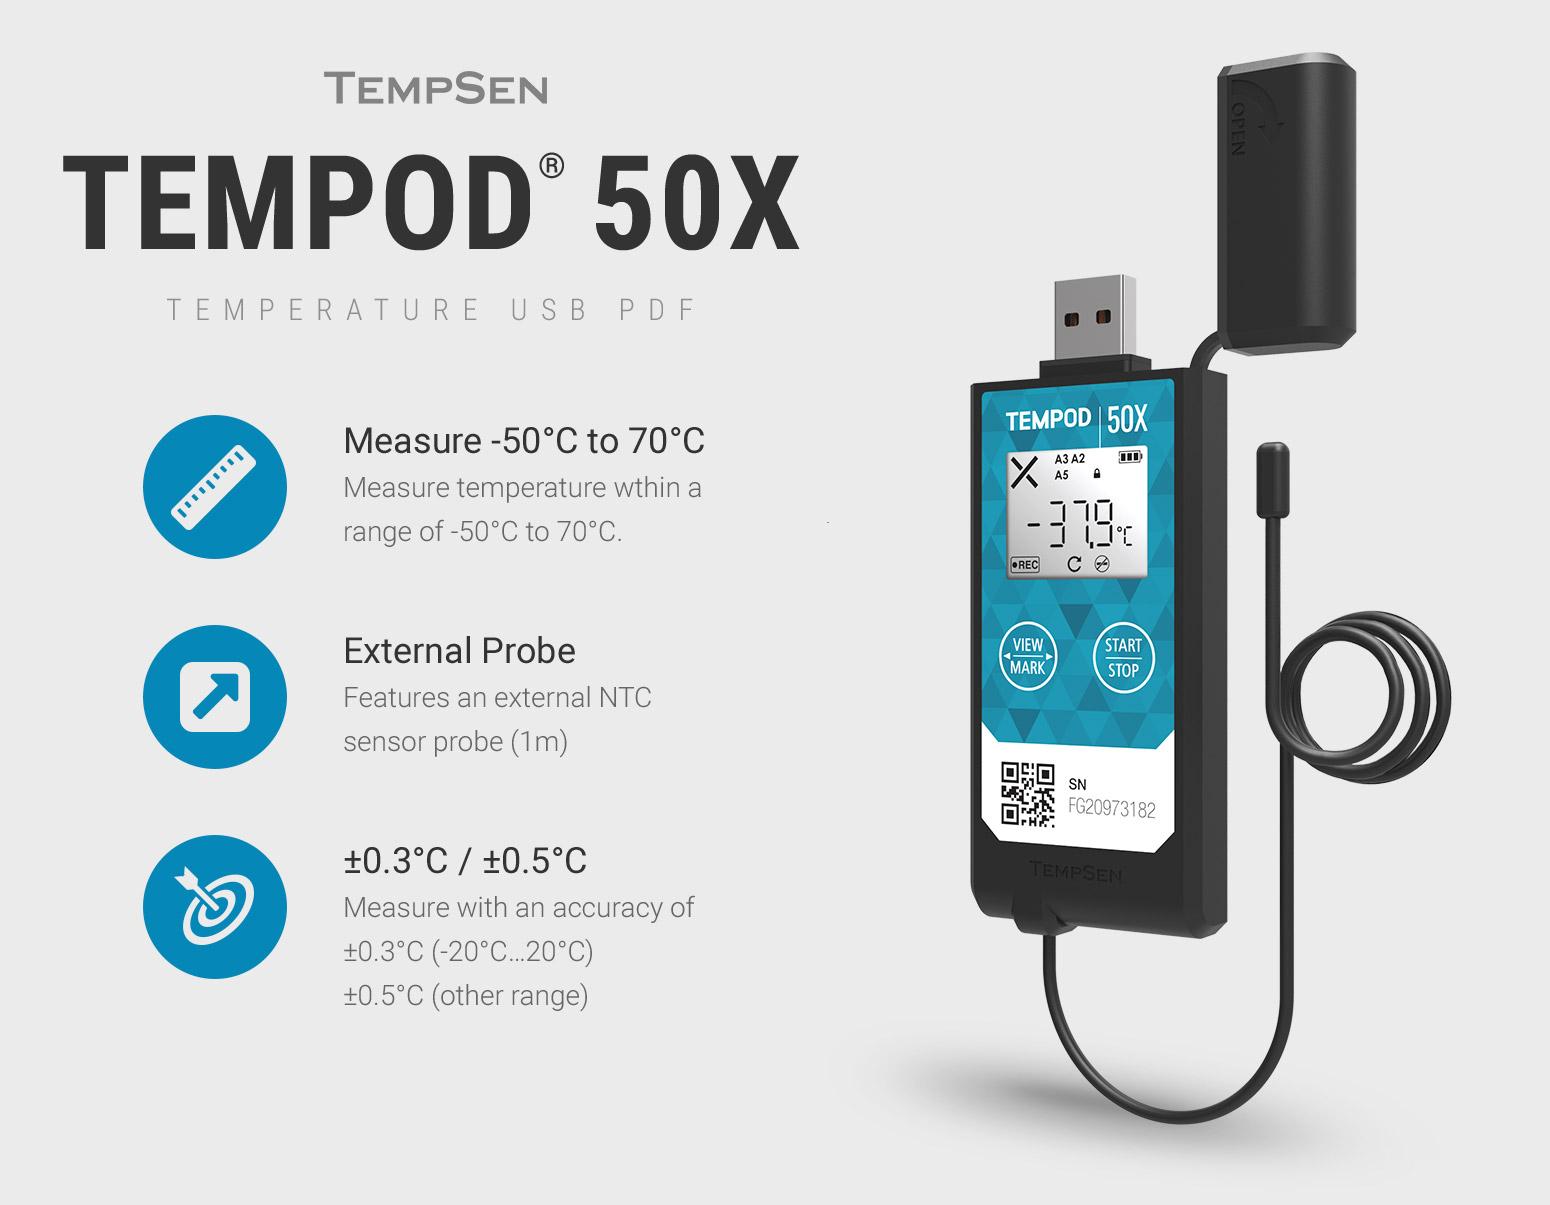 Introducing the Tempod 50X Data Logger